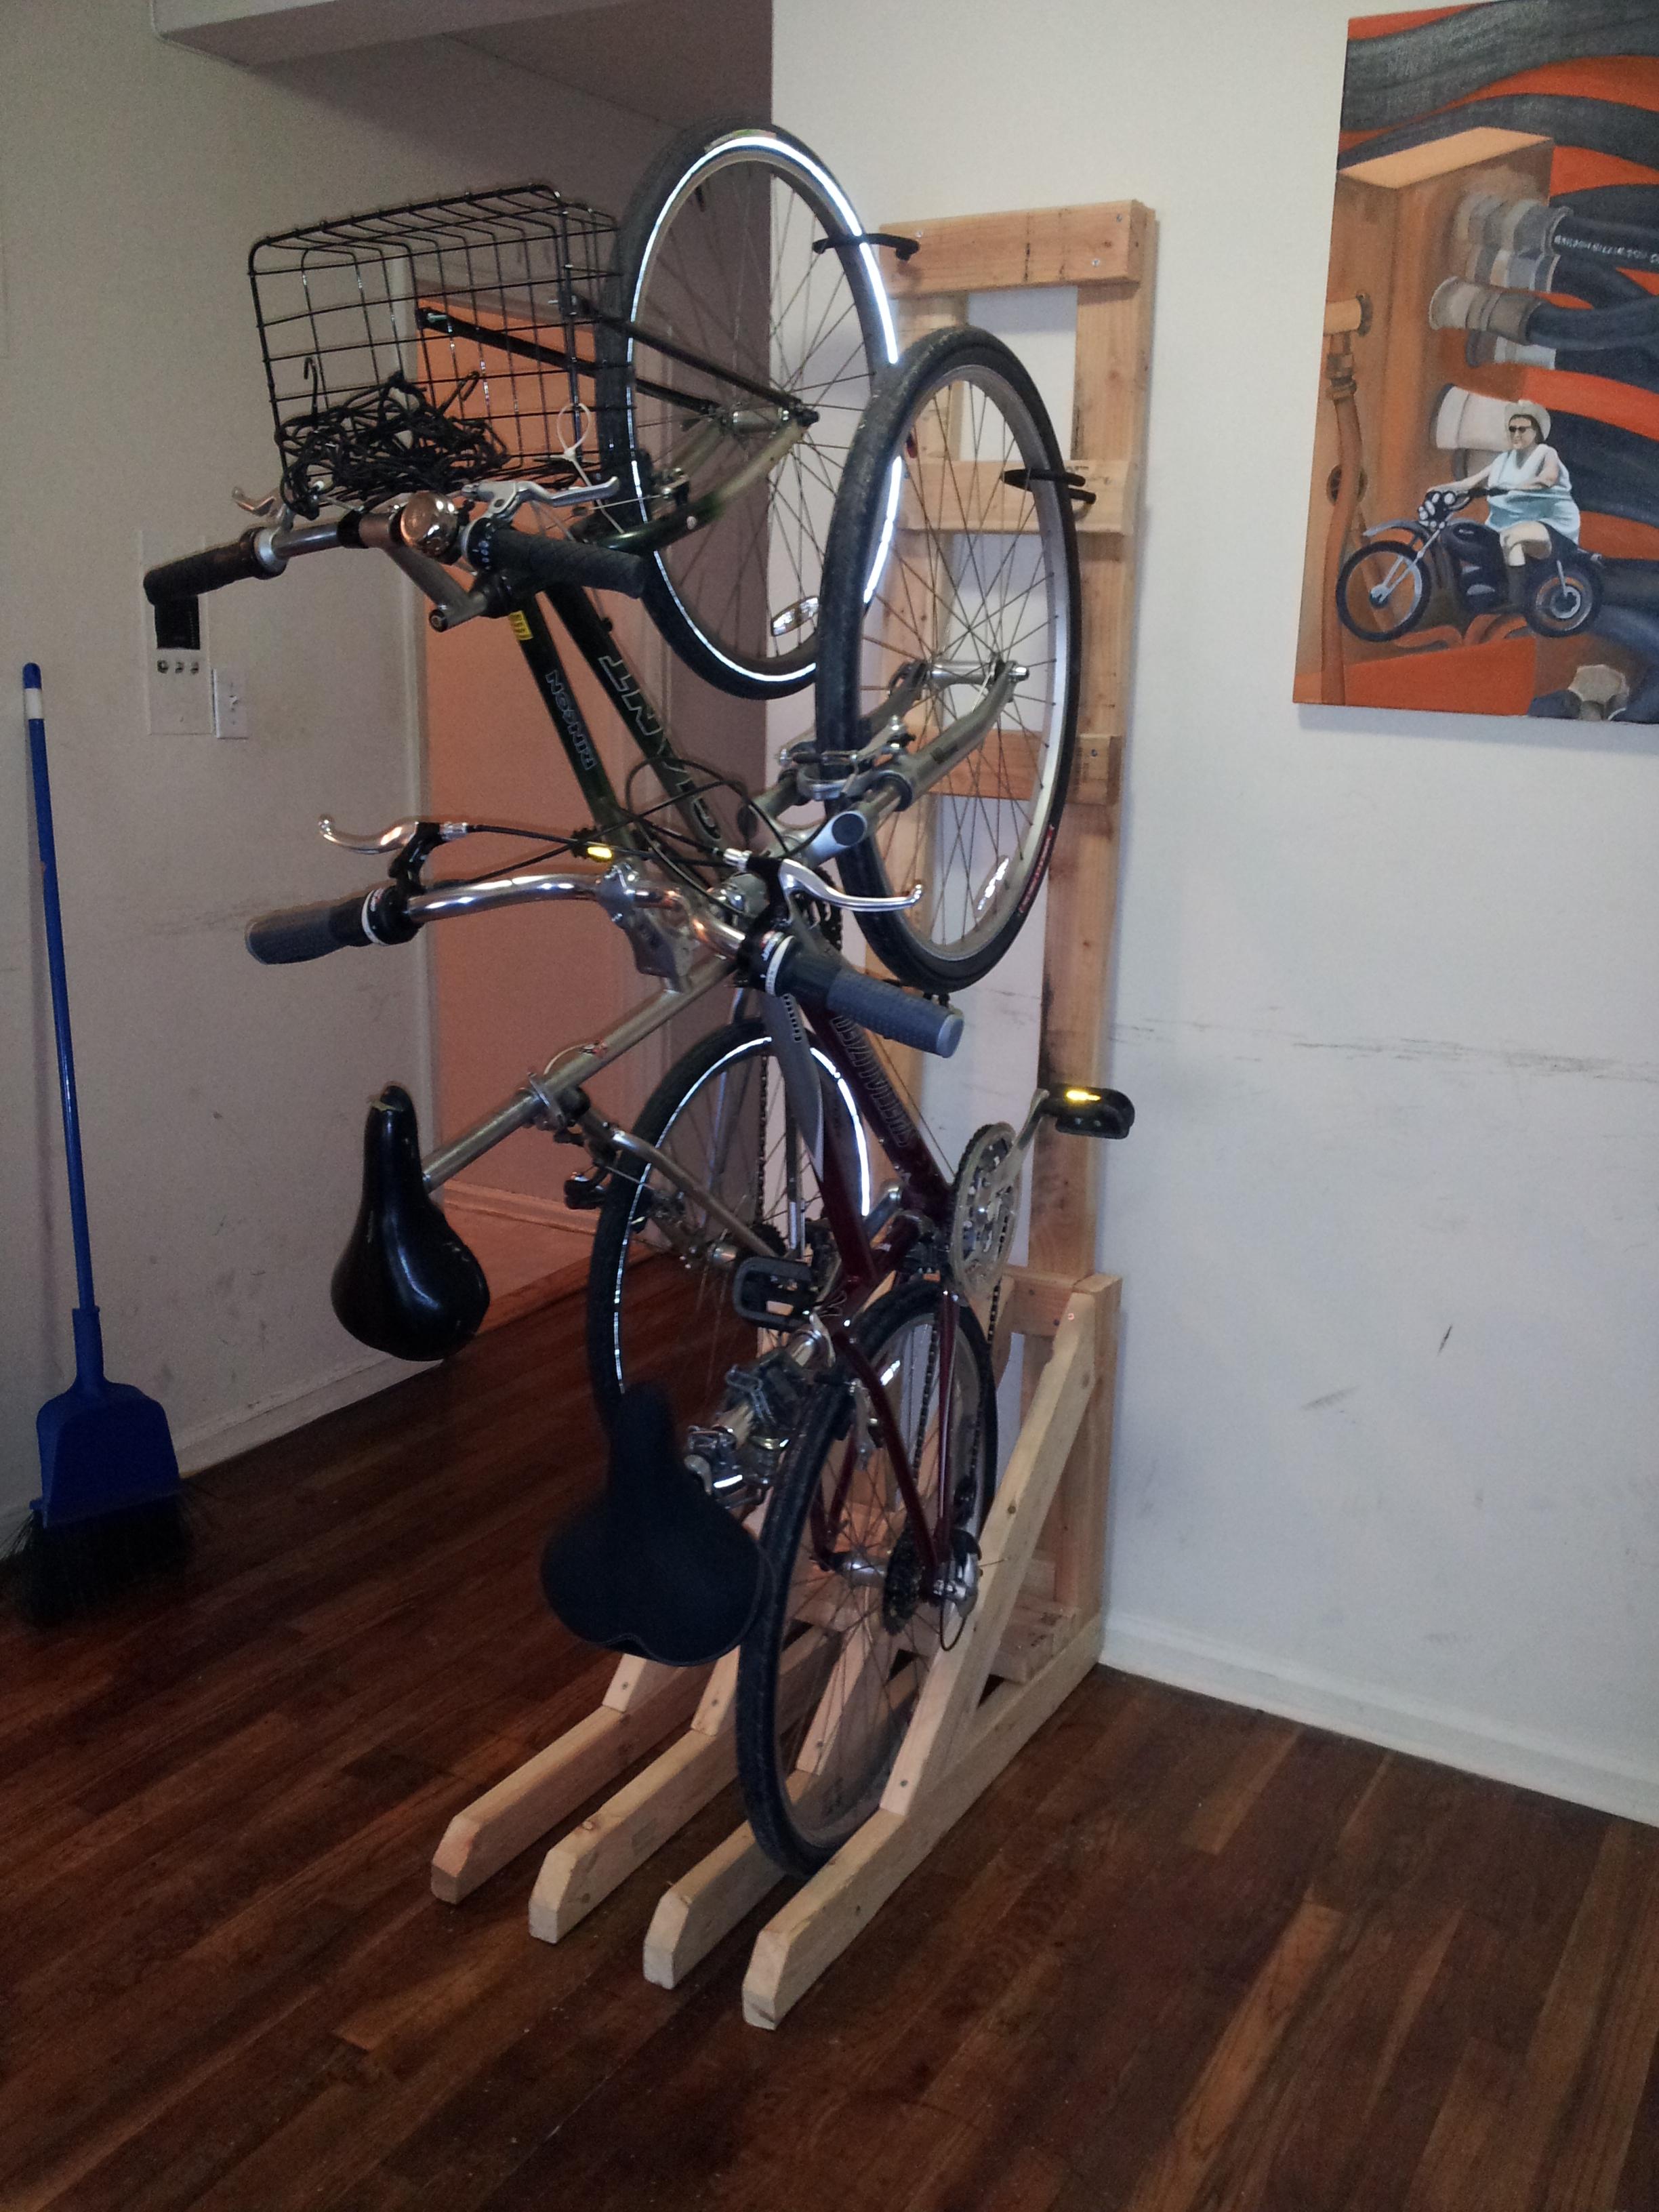 Steel Floor Parking Rack Non-Slip Mountain Bikes Sturdy Bike Stand for Road Bike